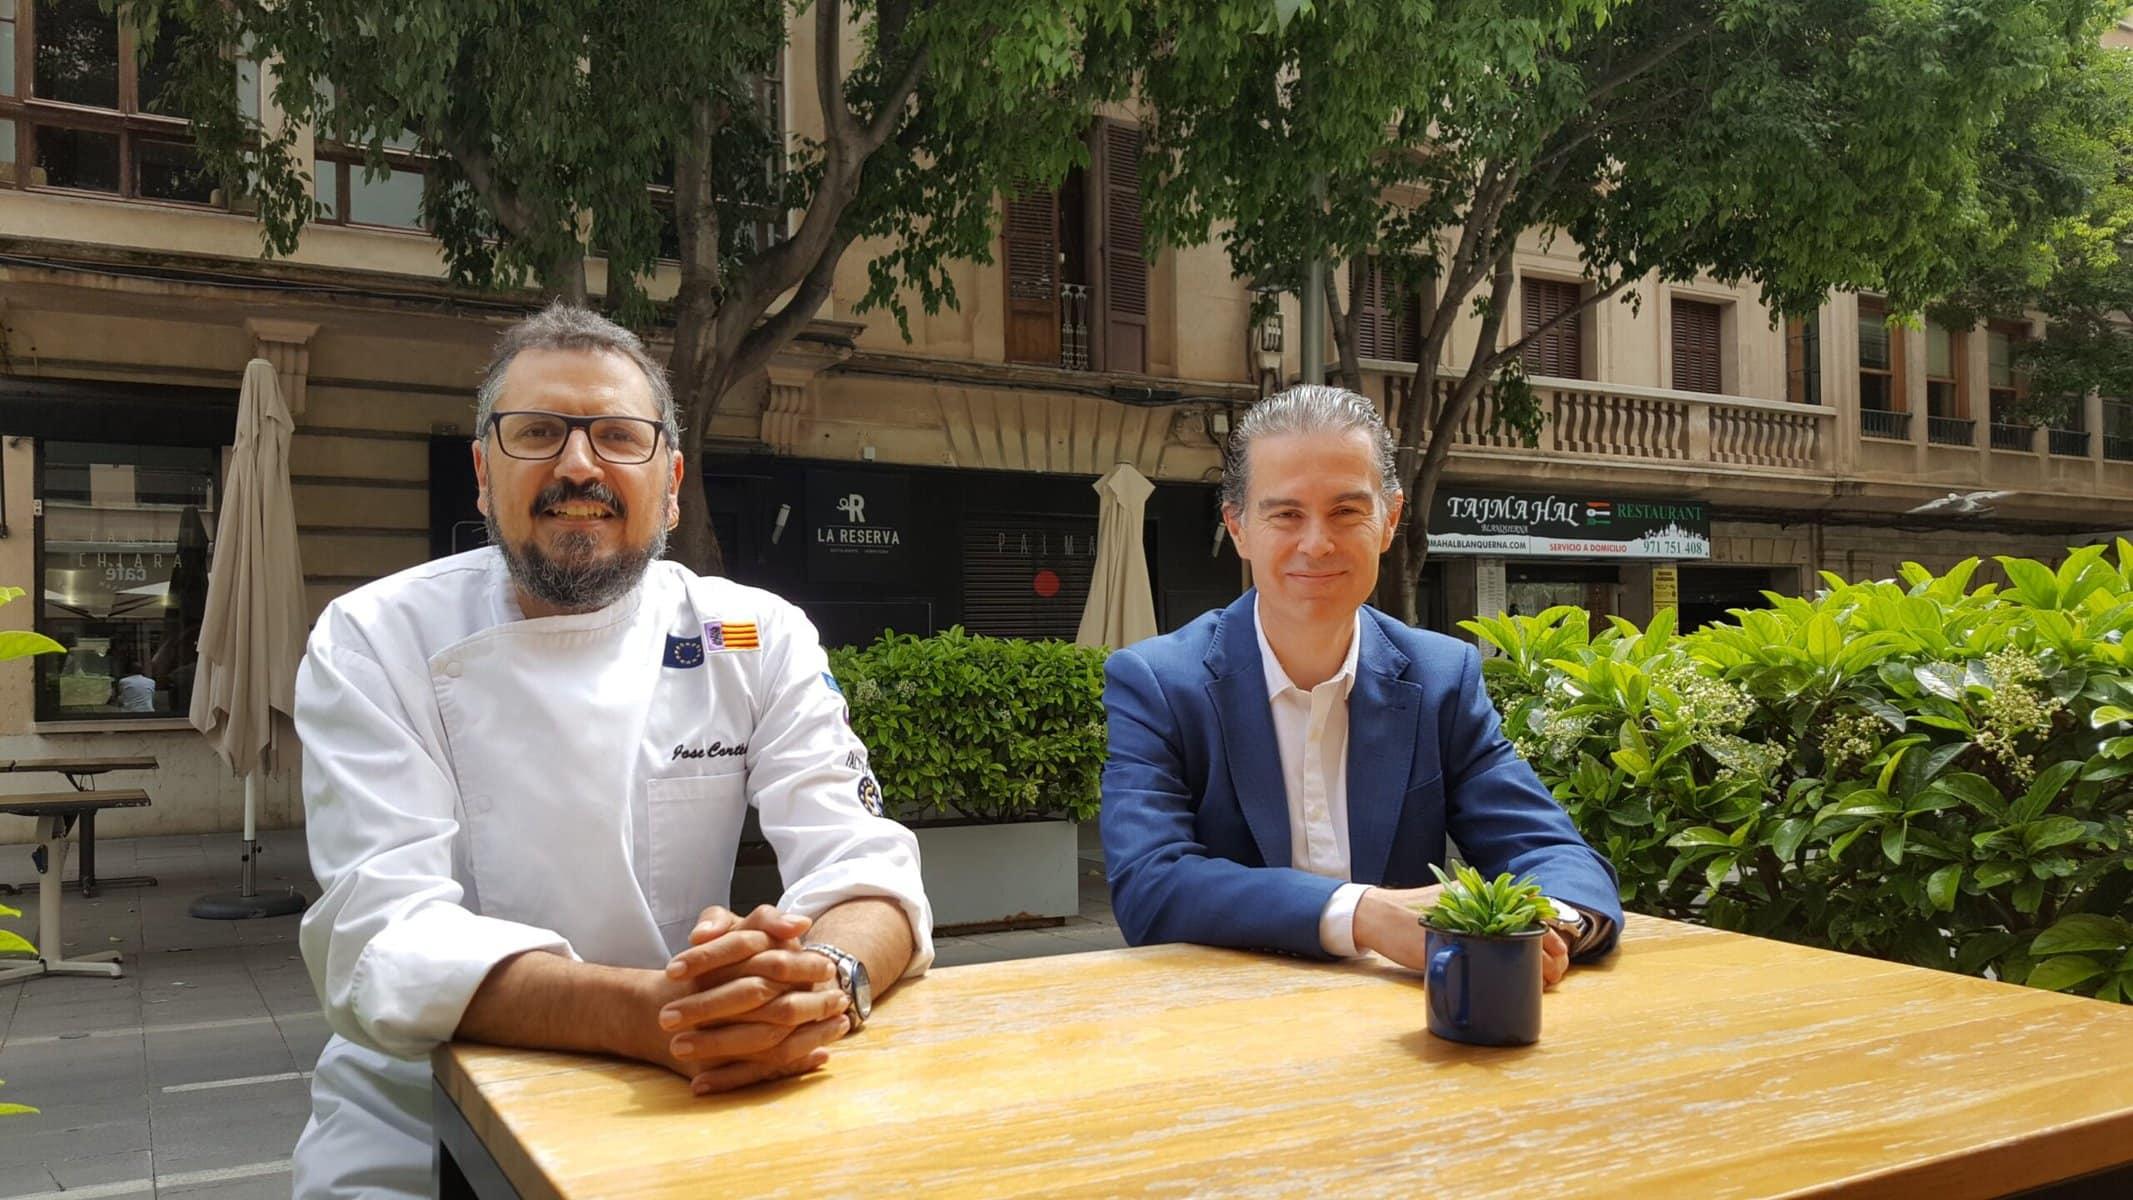 Interview with José Cortés García, Diablito's executive chef